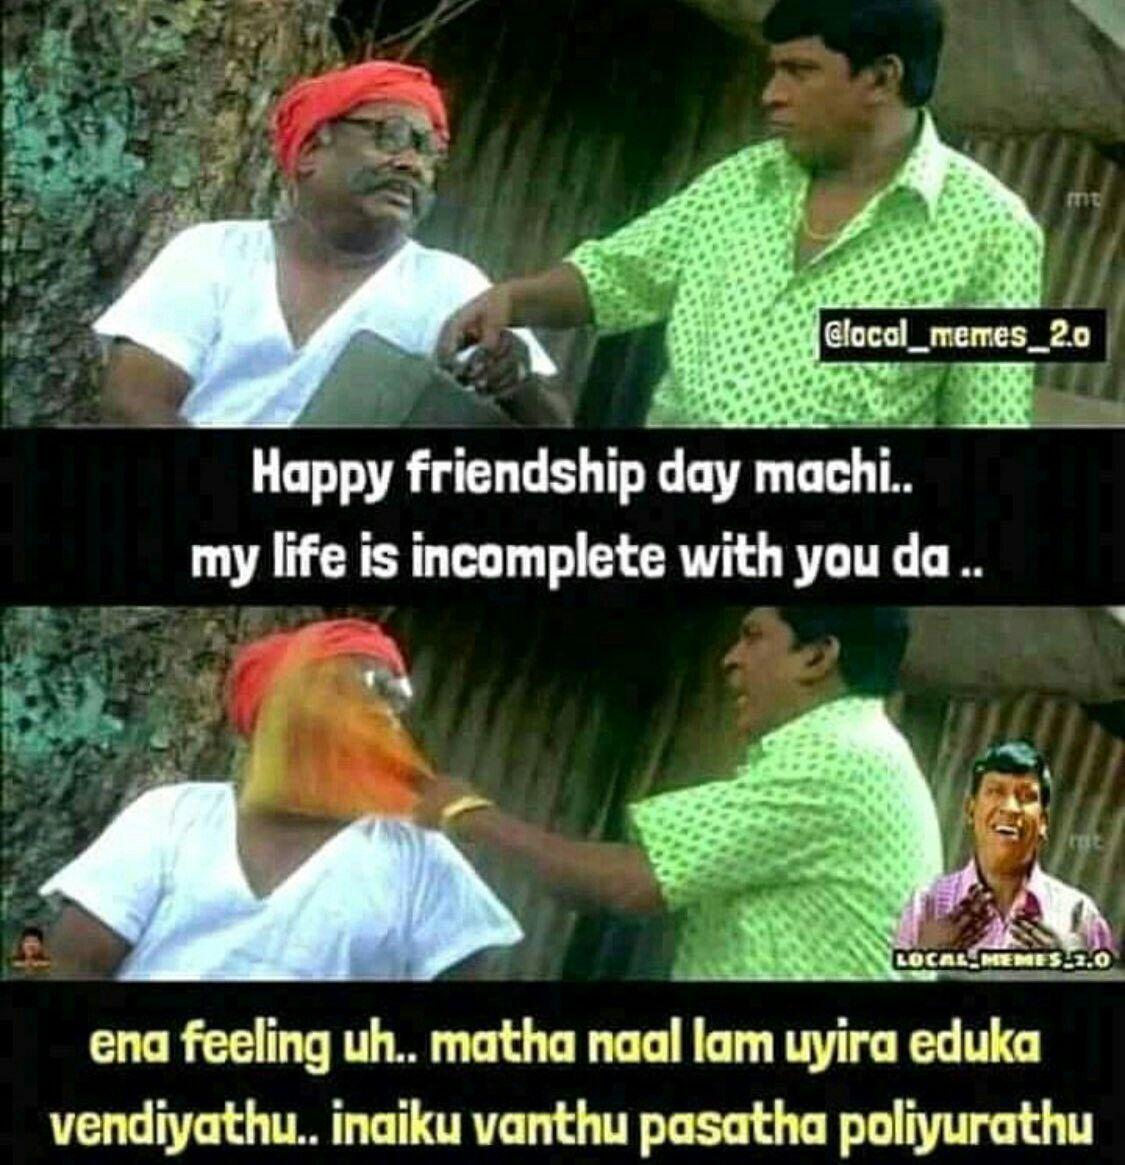 Pin By Harish On Vadivelu Meme Comedy Memes Vadivelu Memes Funny Comedy